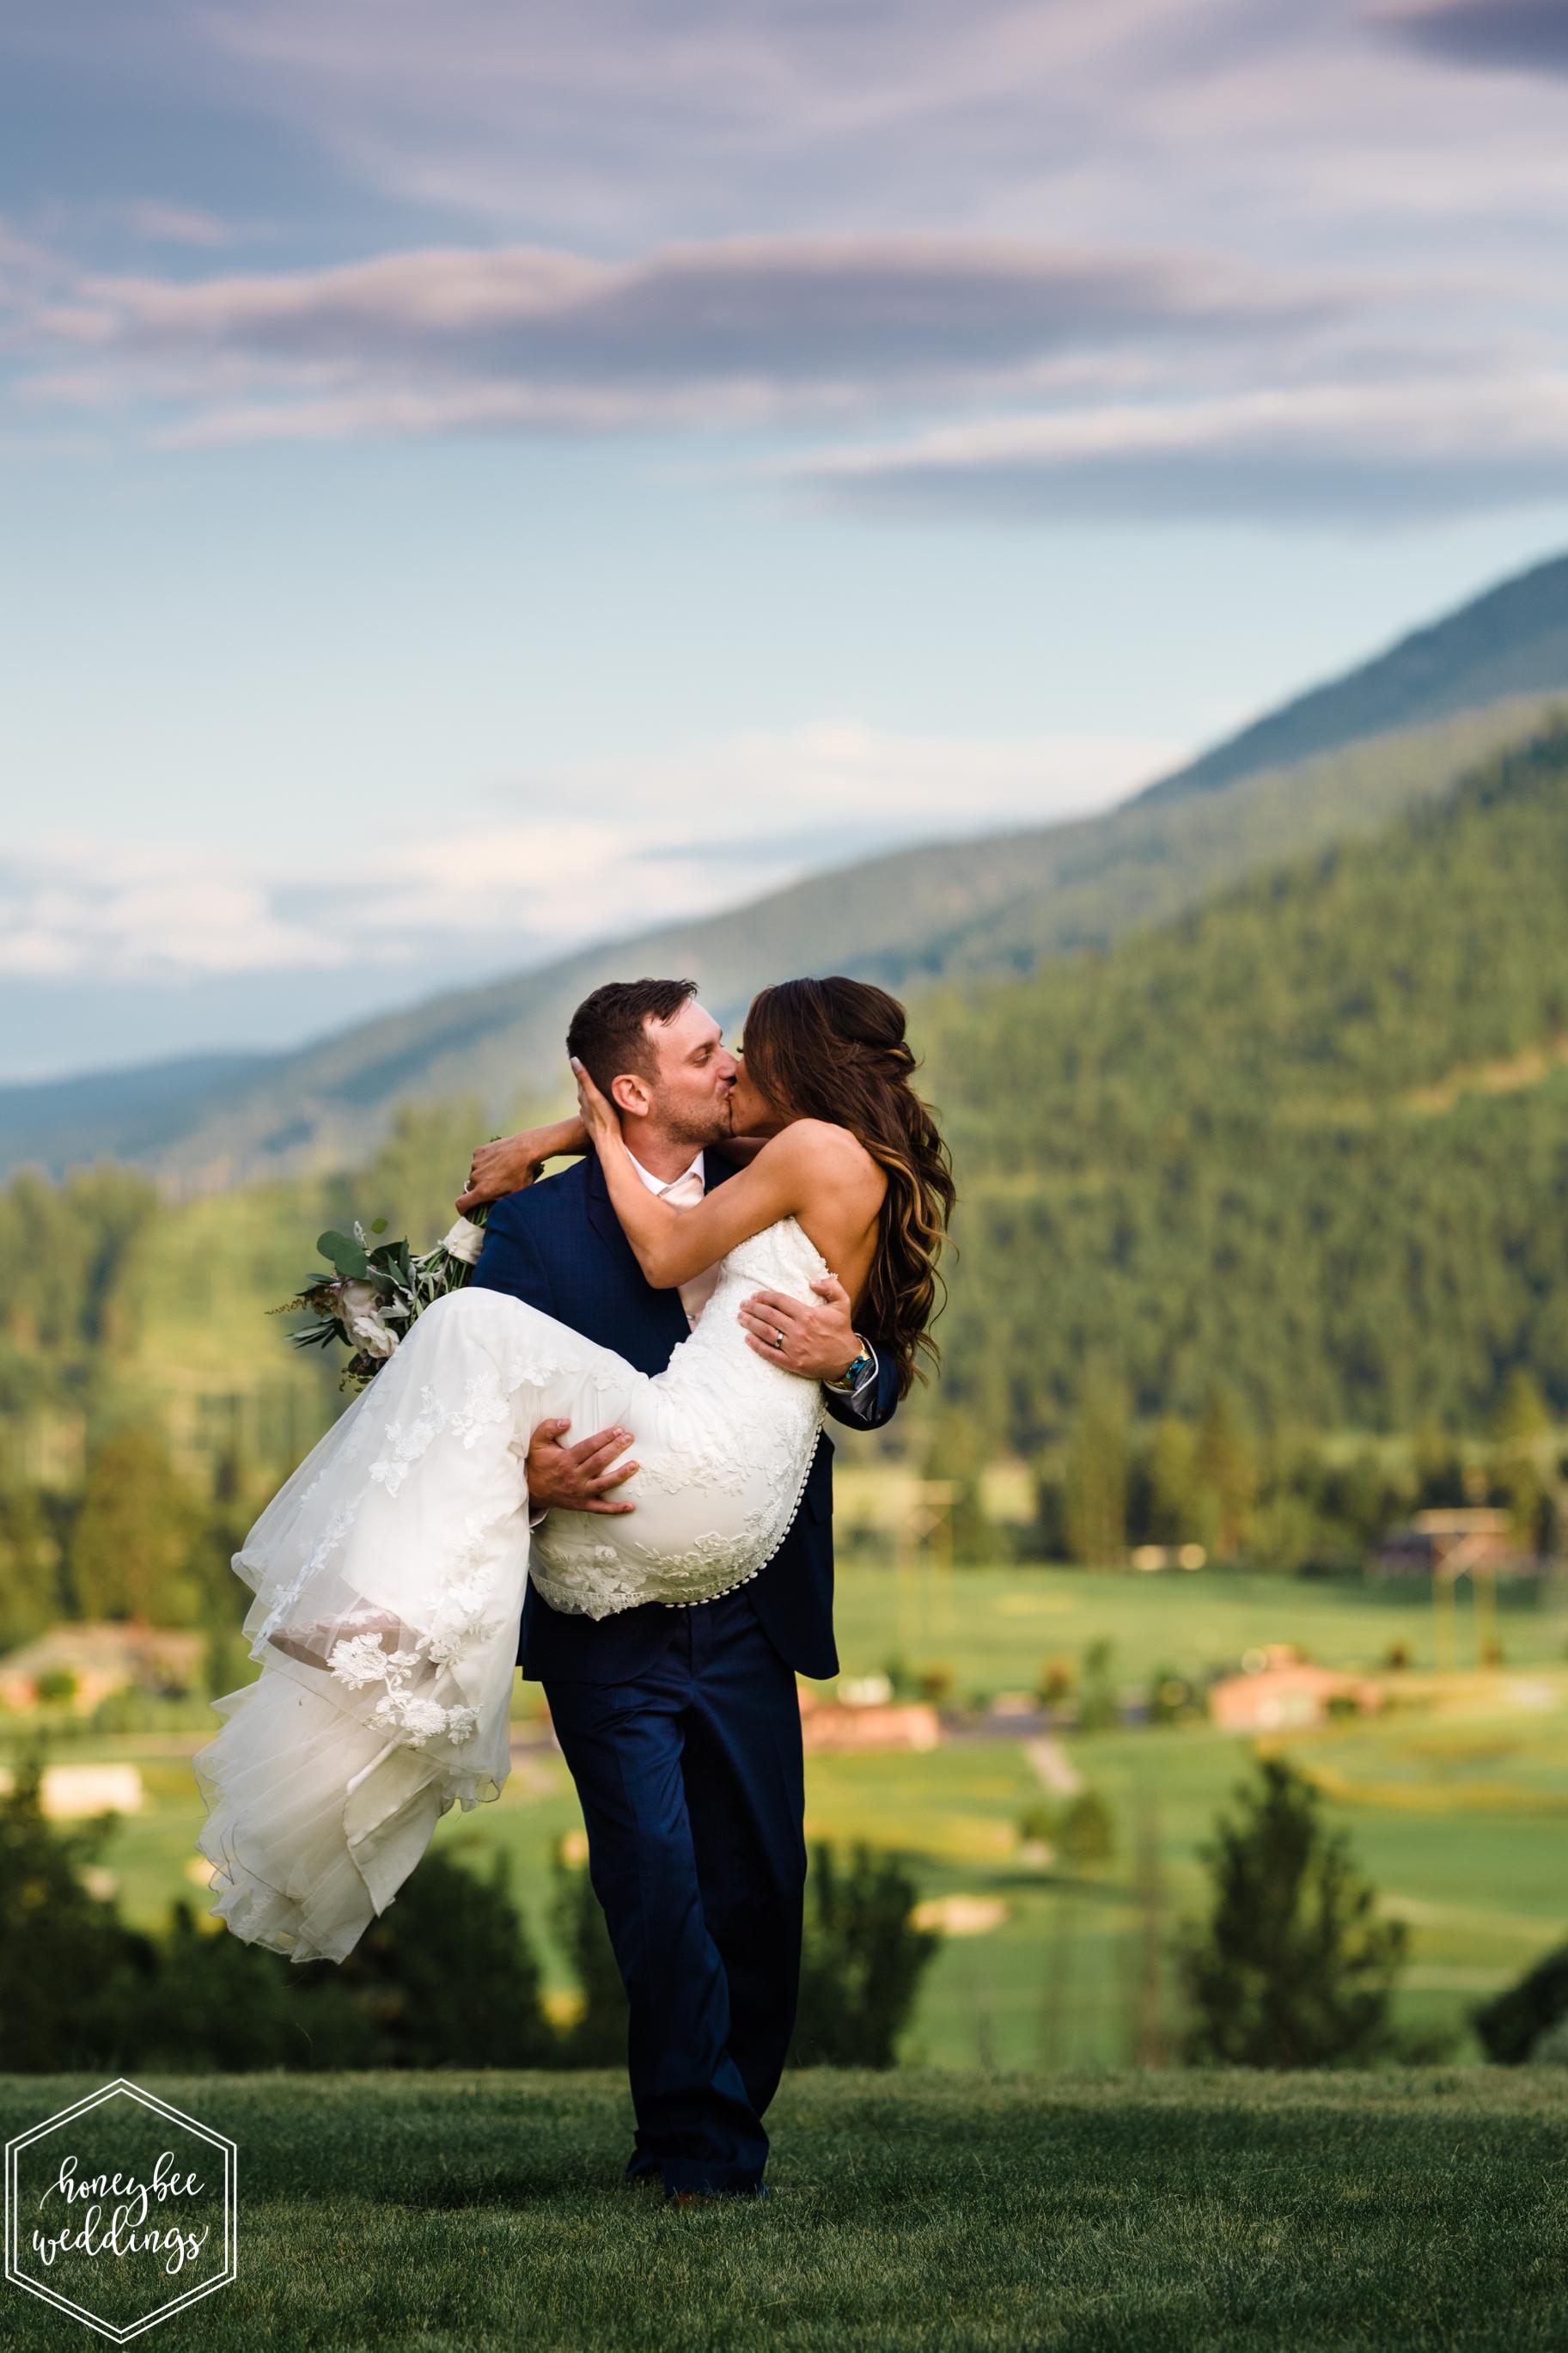 109Montana Wedding Photographer_Missoula Wedding_Honeybee Weddings_Devlin & Jacob_June 22, 2019-2270.jpg